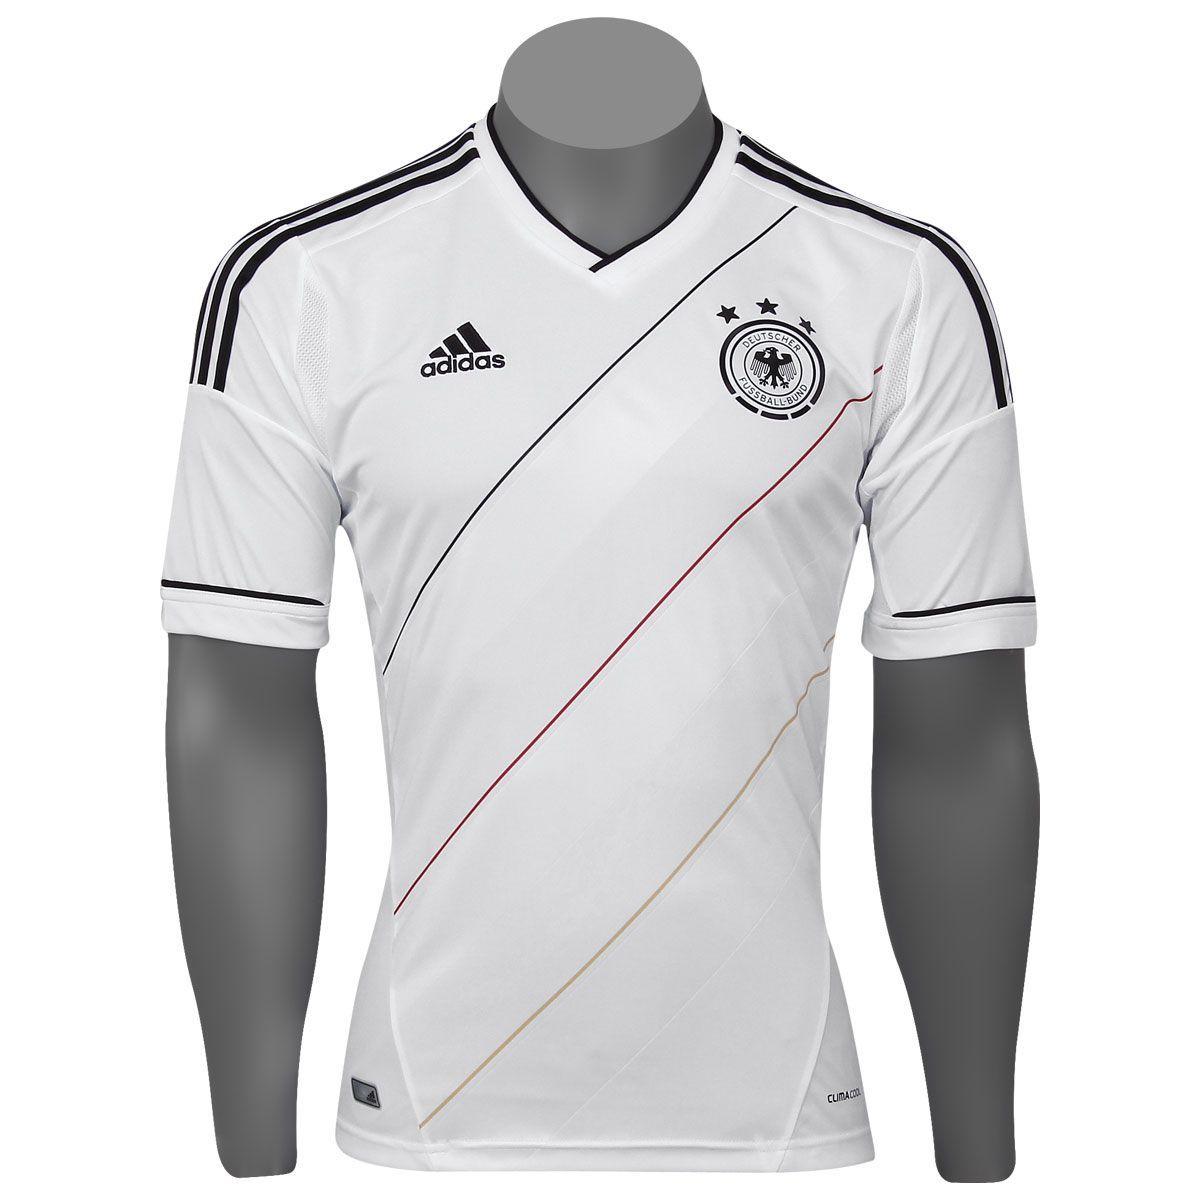 new germany soccer jersey  53d6652c7